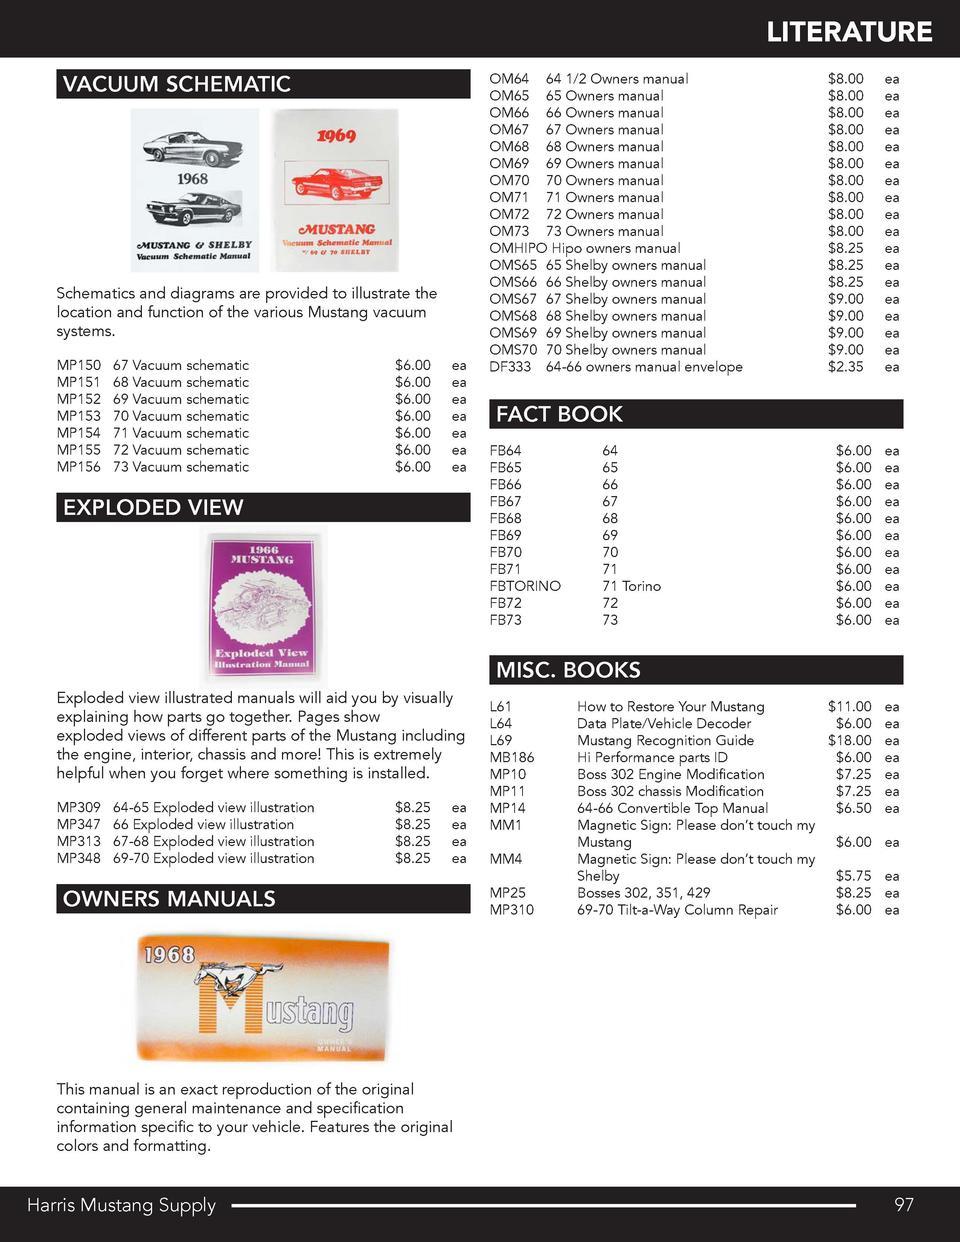 Harris Mustang Catalog : simplebooklet.com